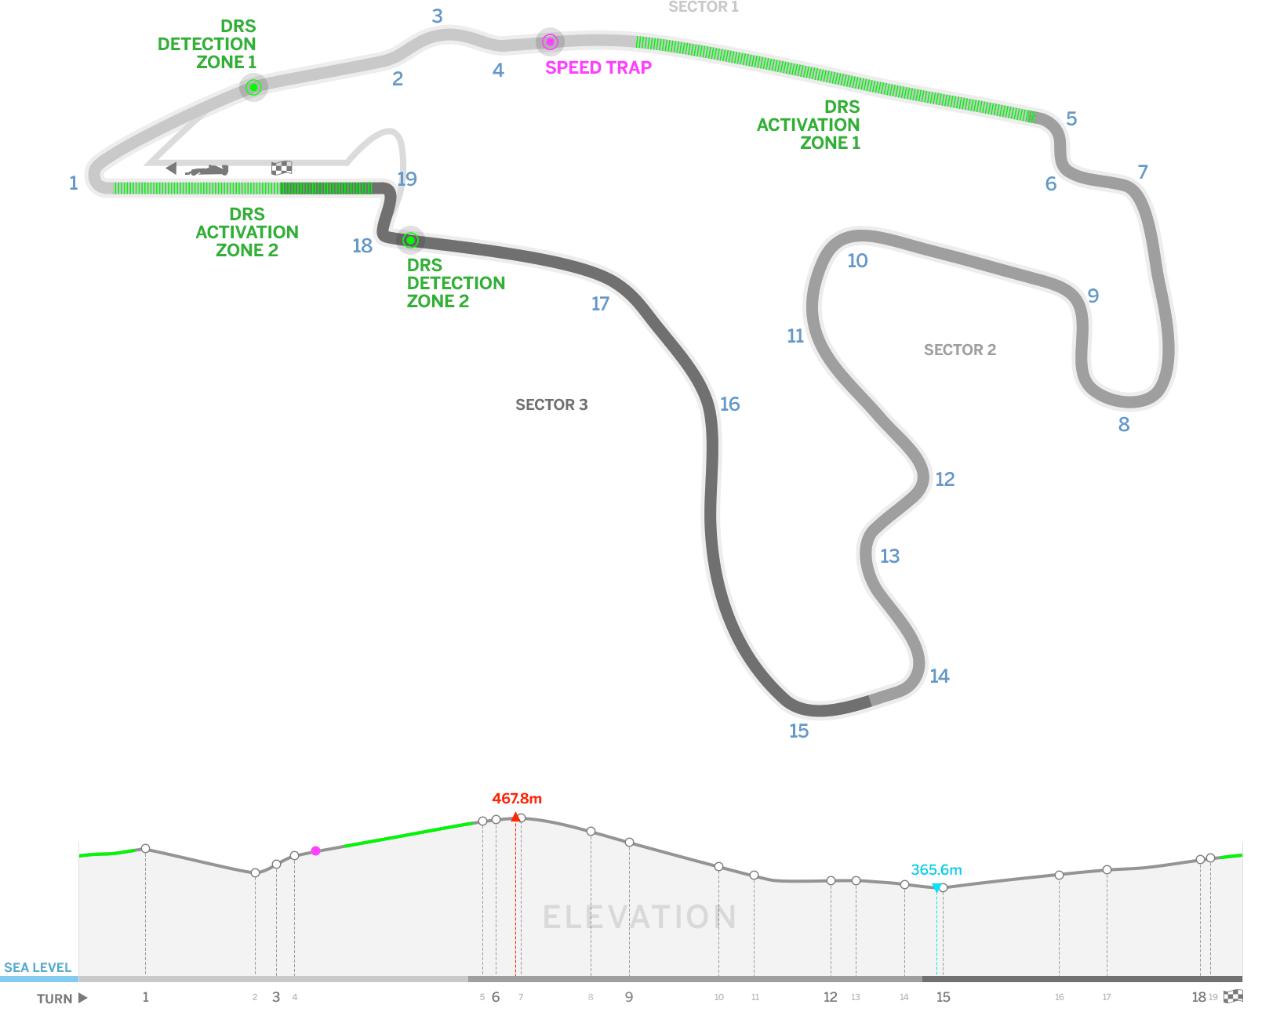 F1 Track Diagram